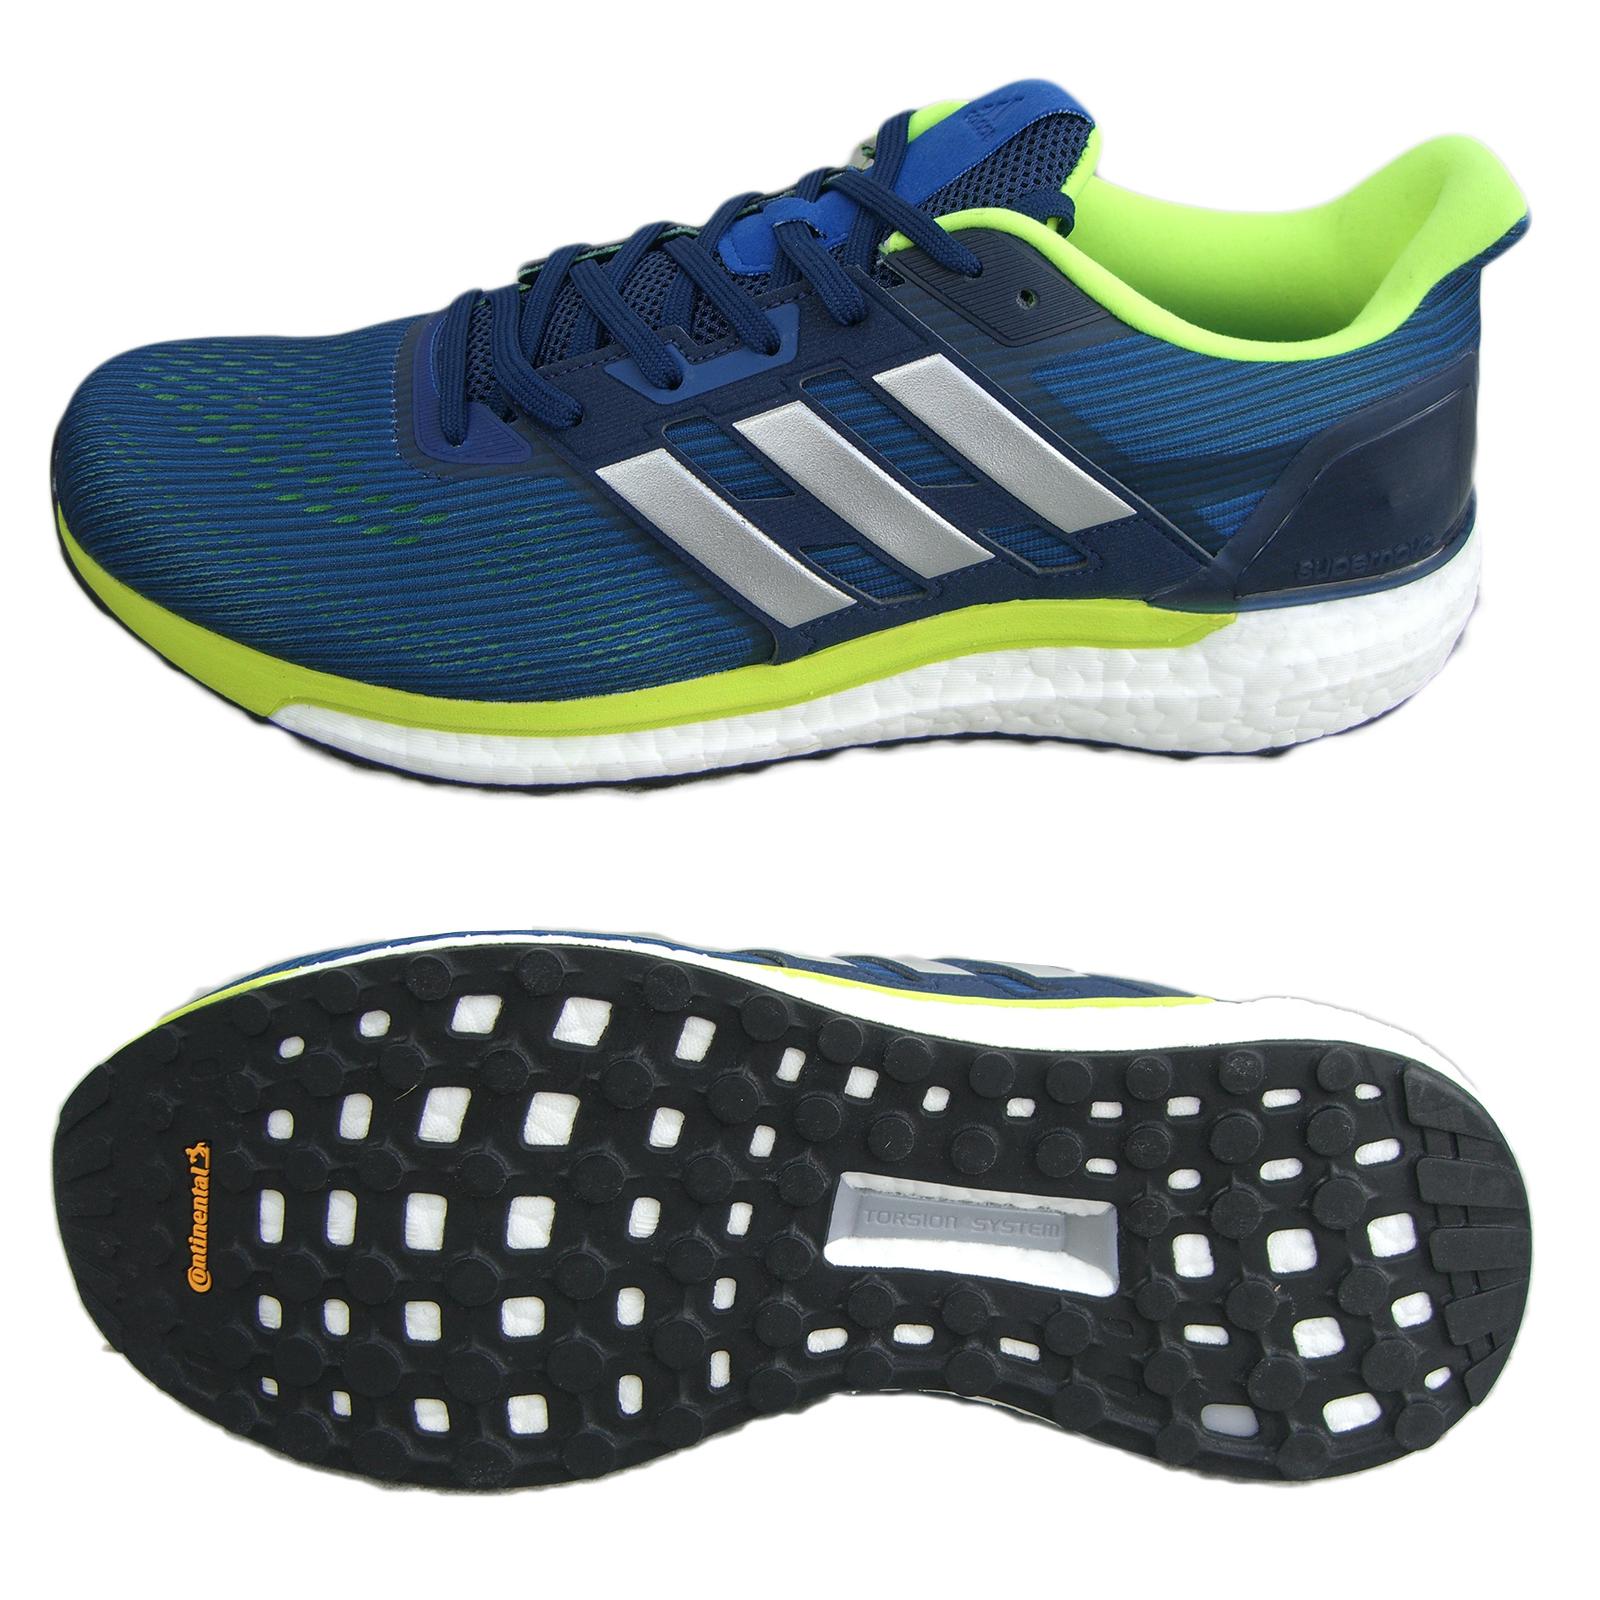 Adidas Supernova Glide 7 M Herren 41 Laufschuhe Schuhe